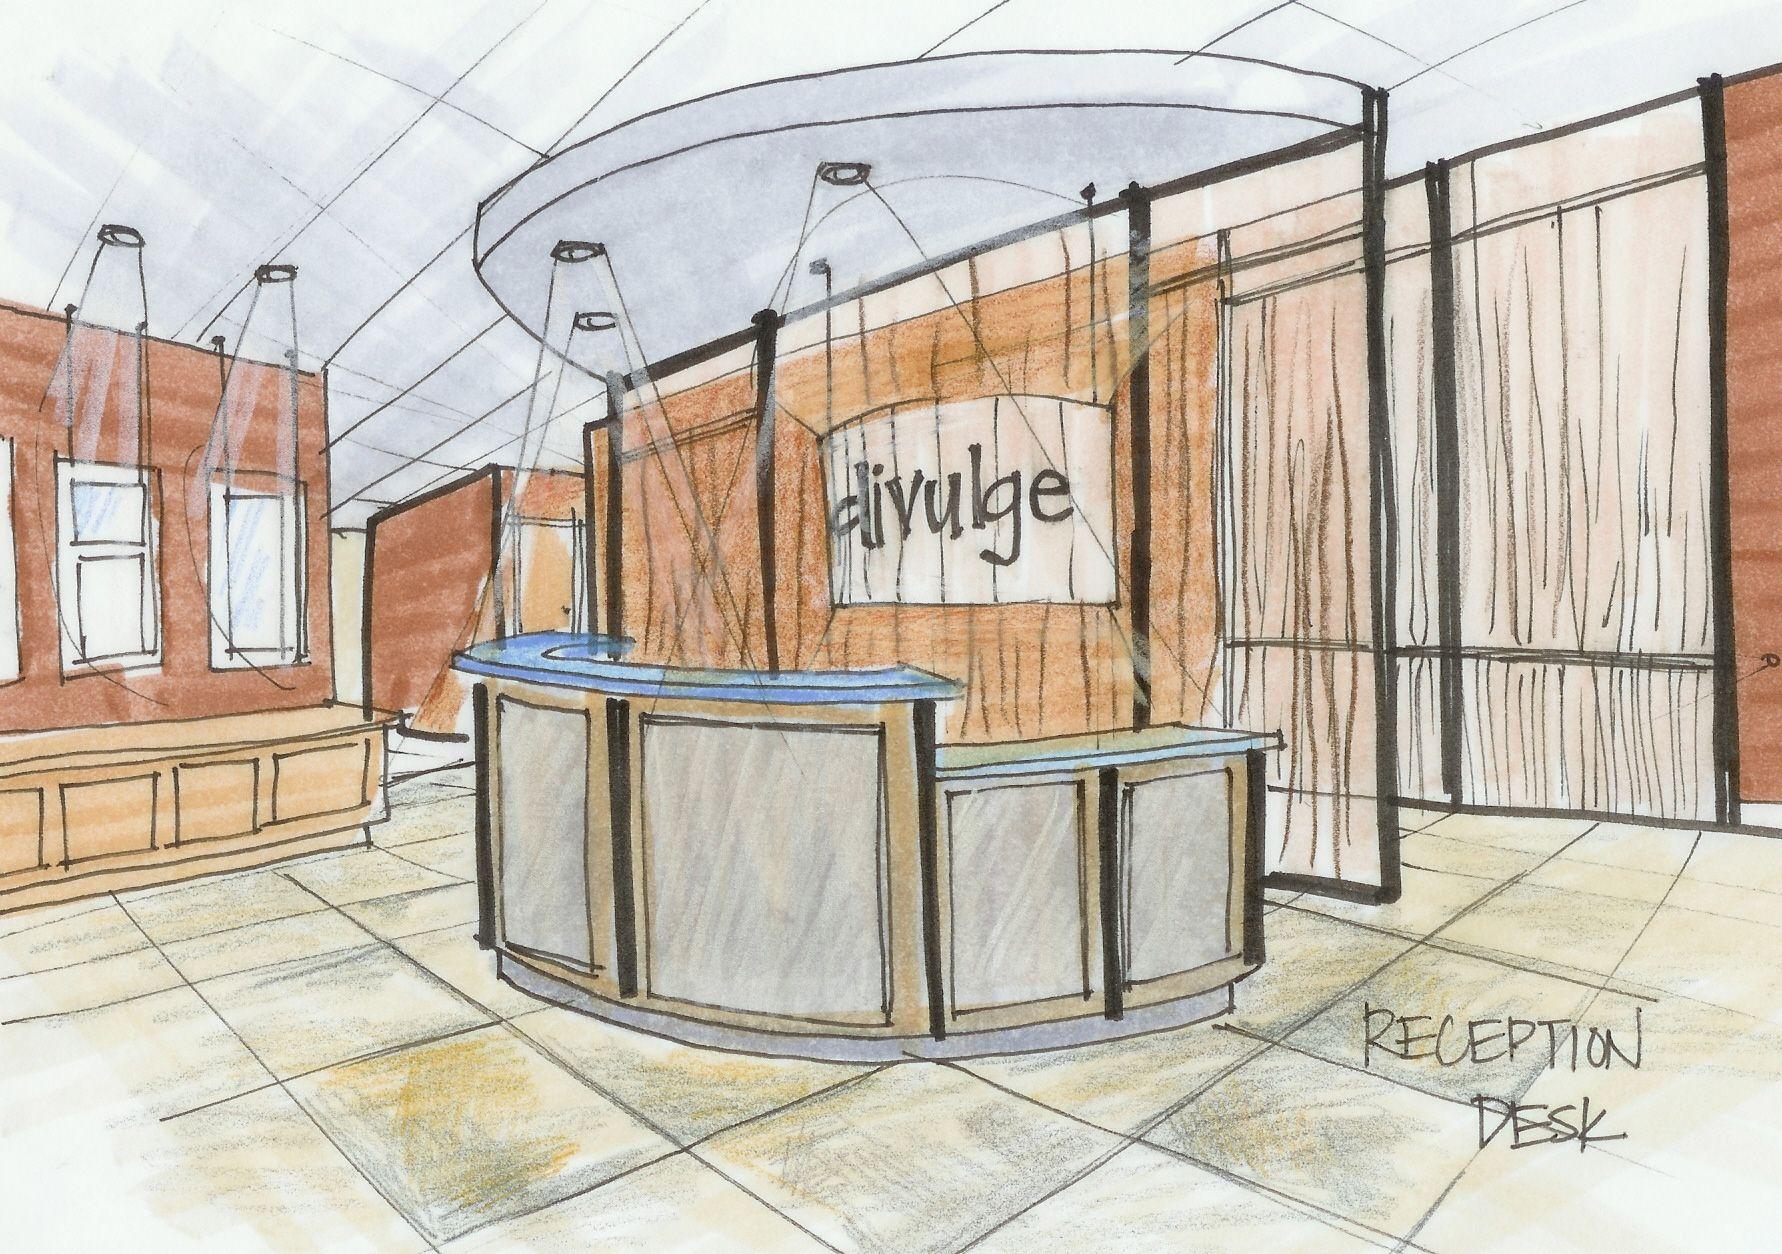 reception desk sketch - Google Search